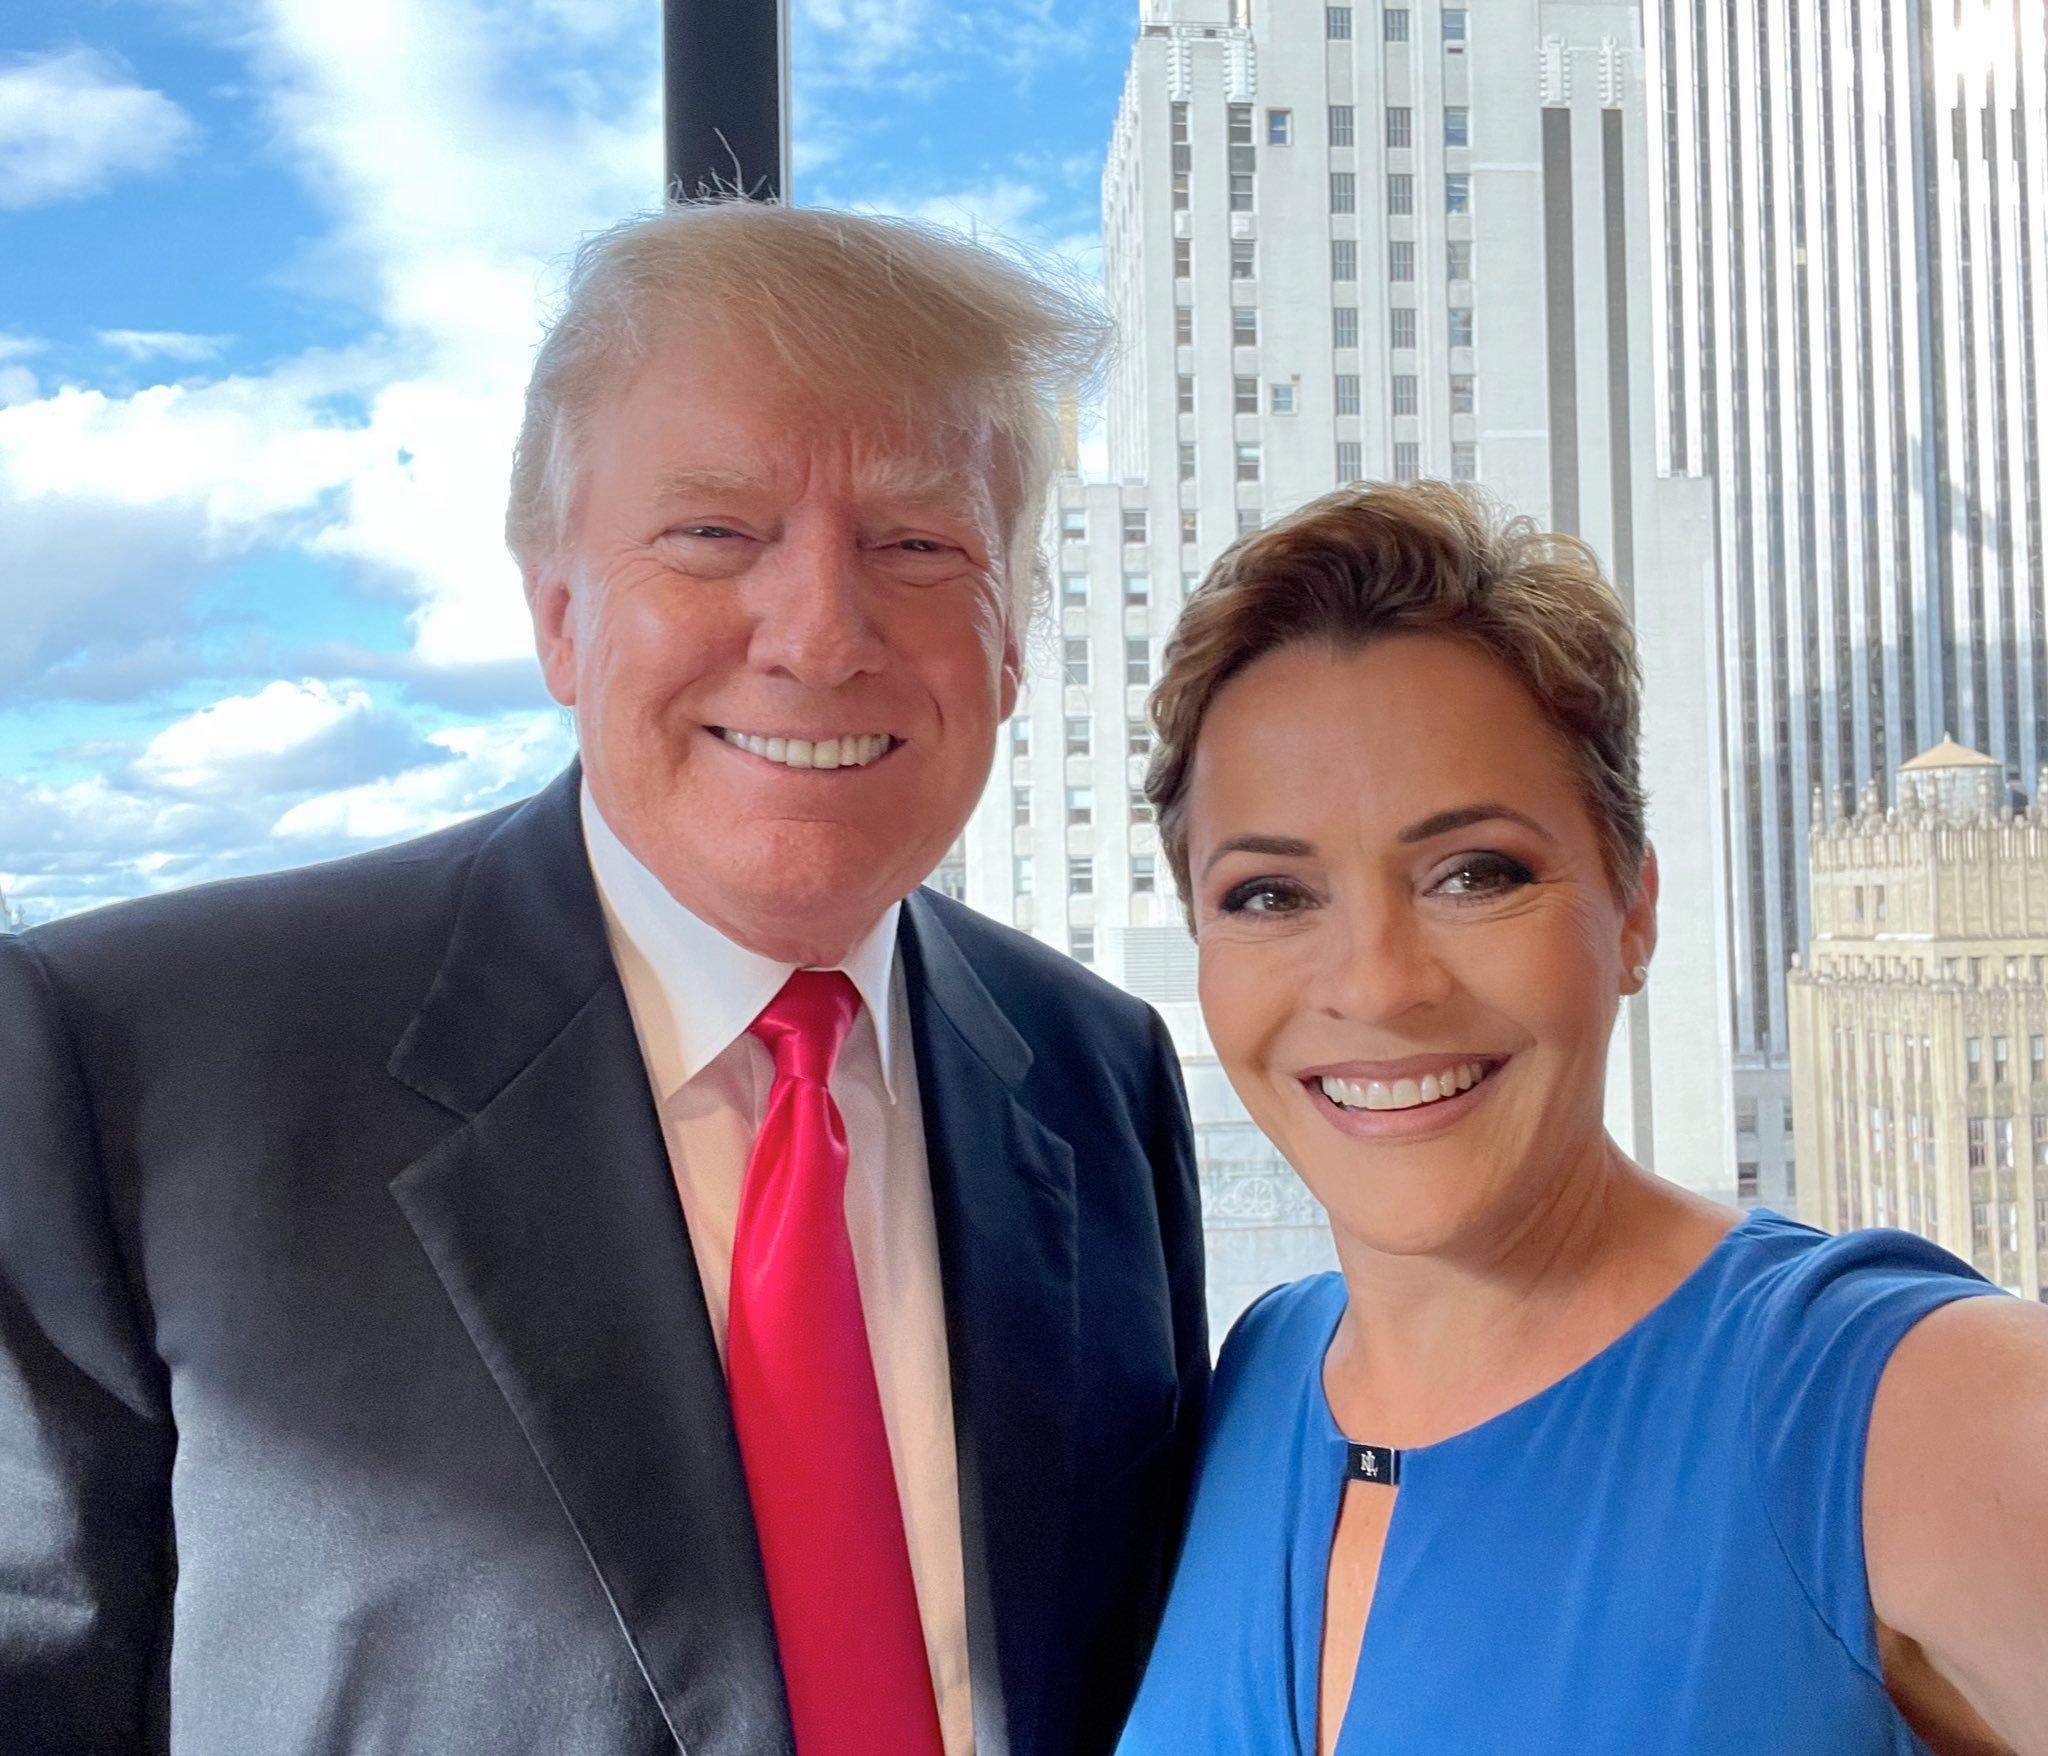 President Donald Trump, left, and Kari Lake, a Republican gubernatorial candidate in Arizona, pose for a selfie.